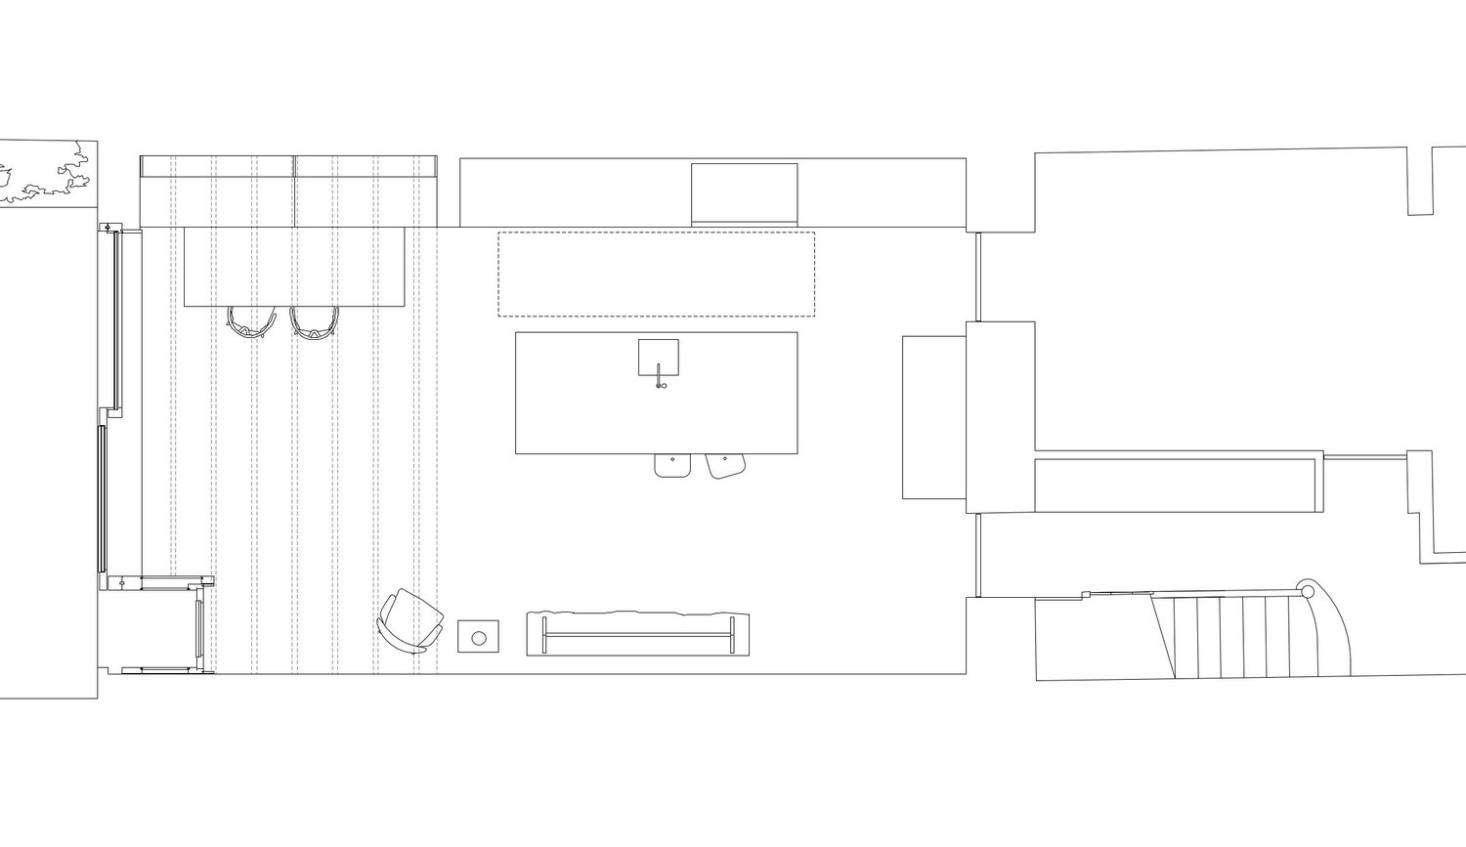 The floor plan of the Victorian&#8